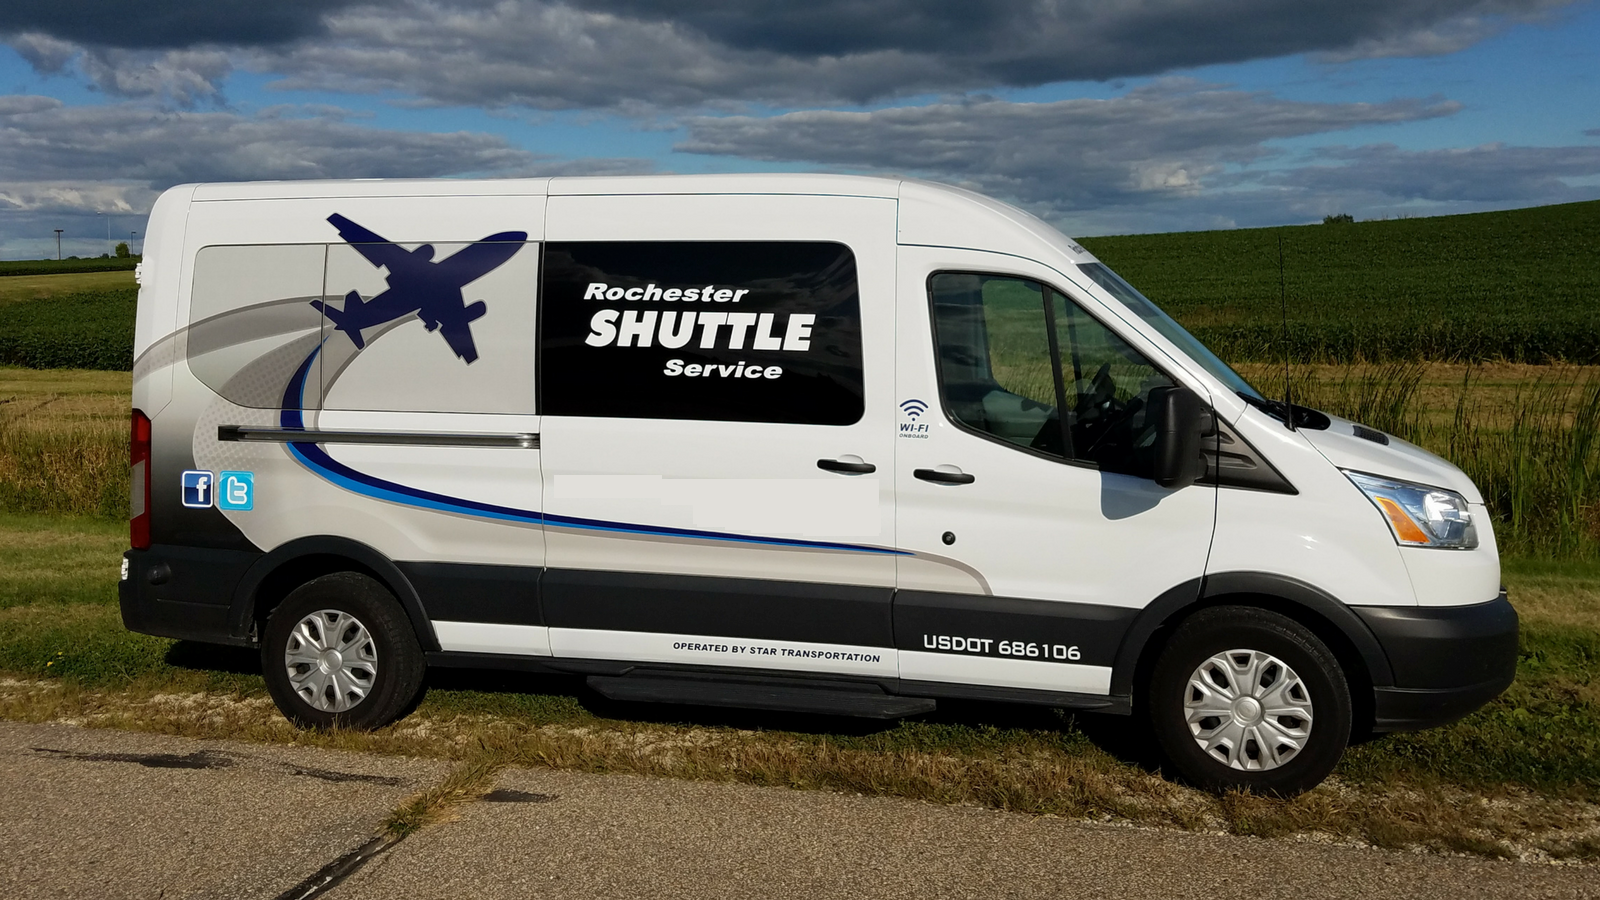 Rochester Shuttle Service vehicle 1